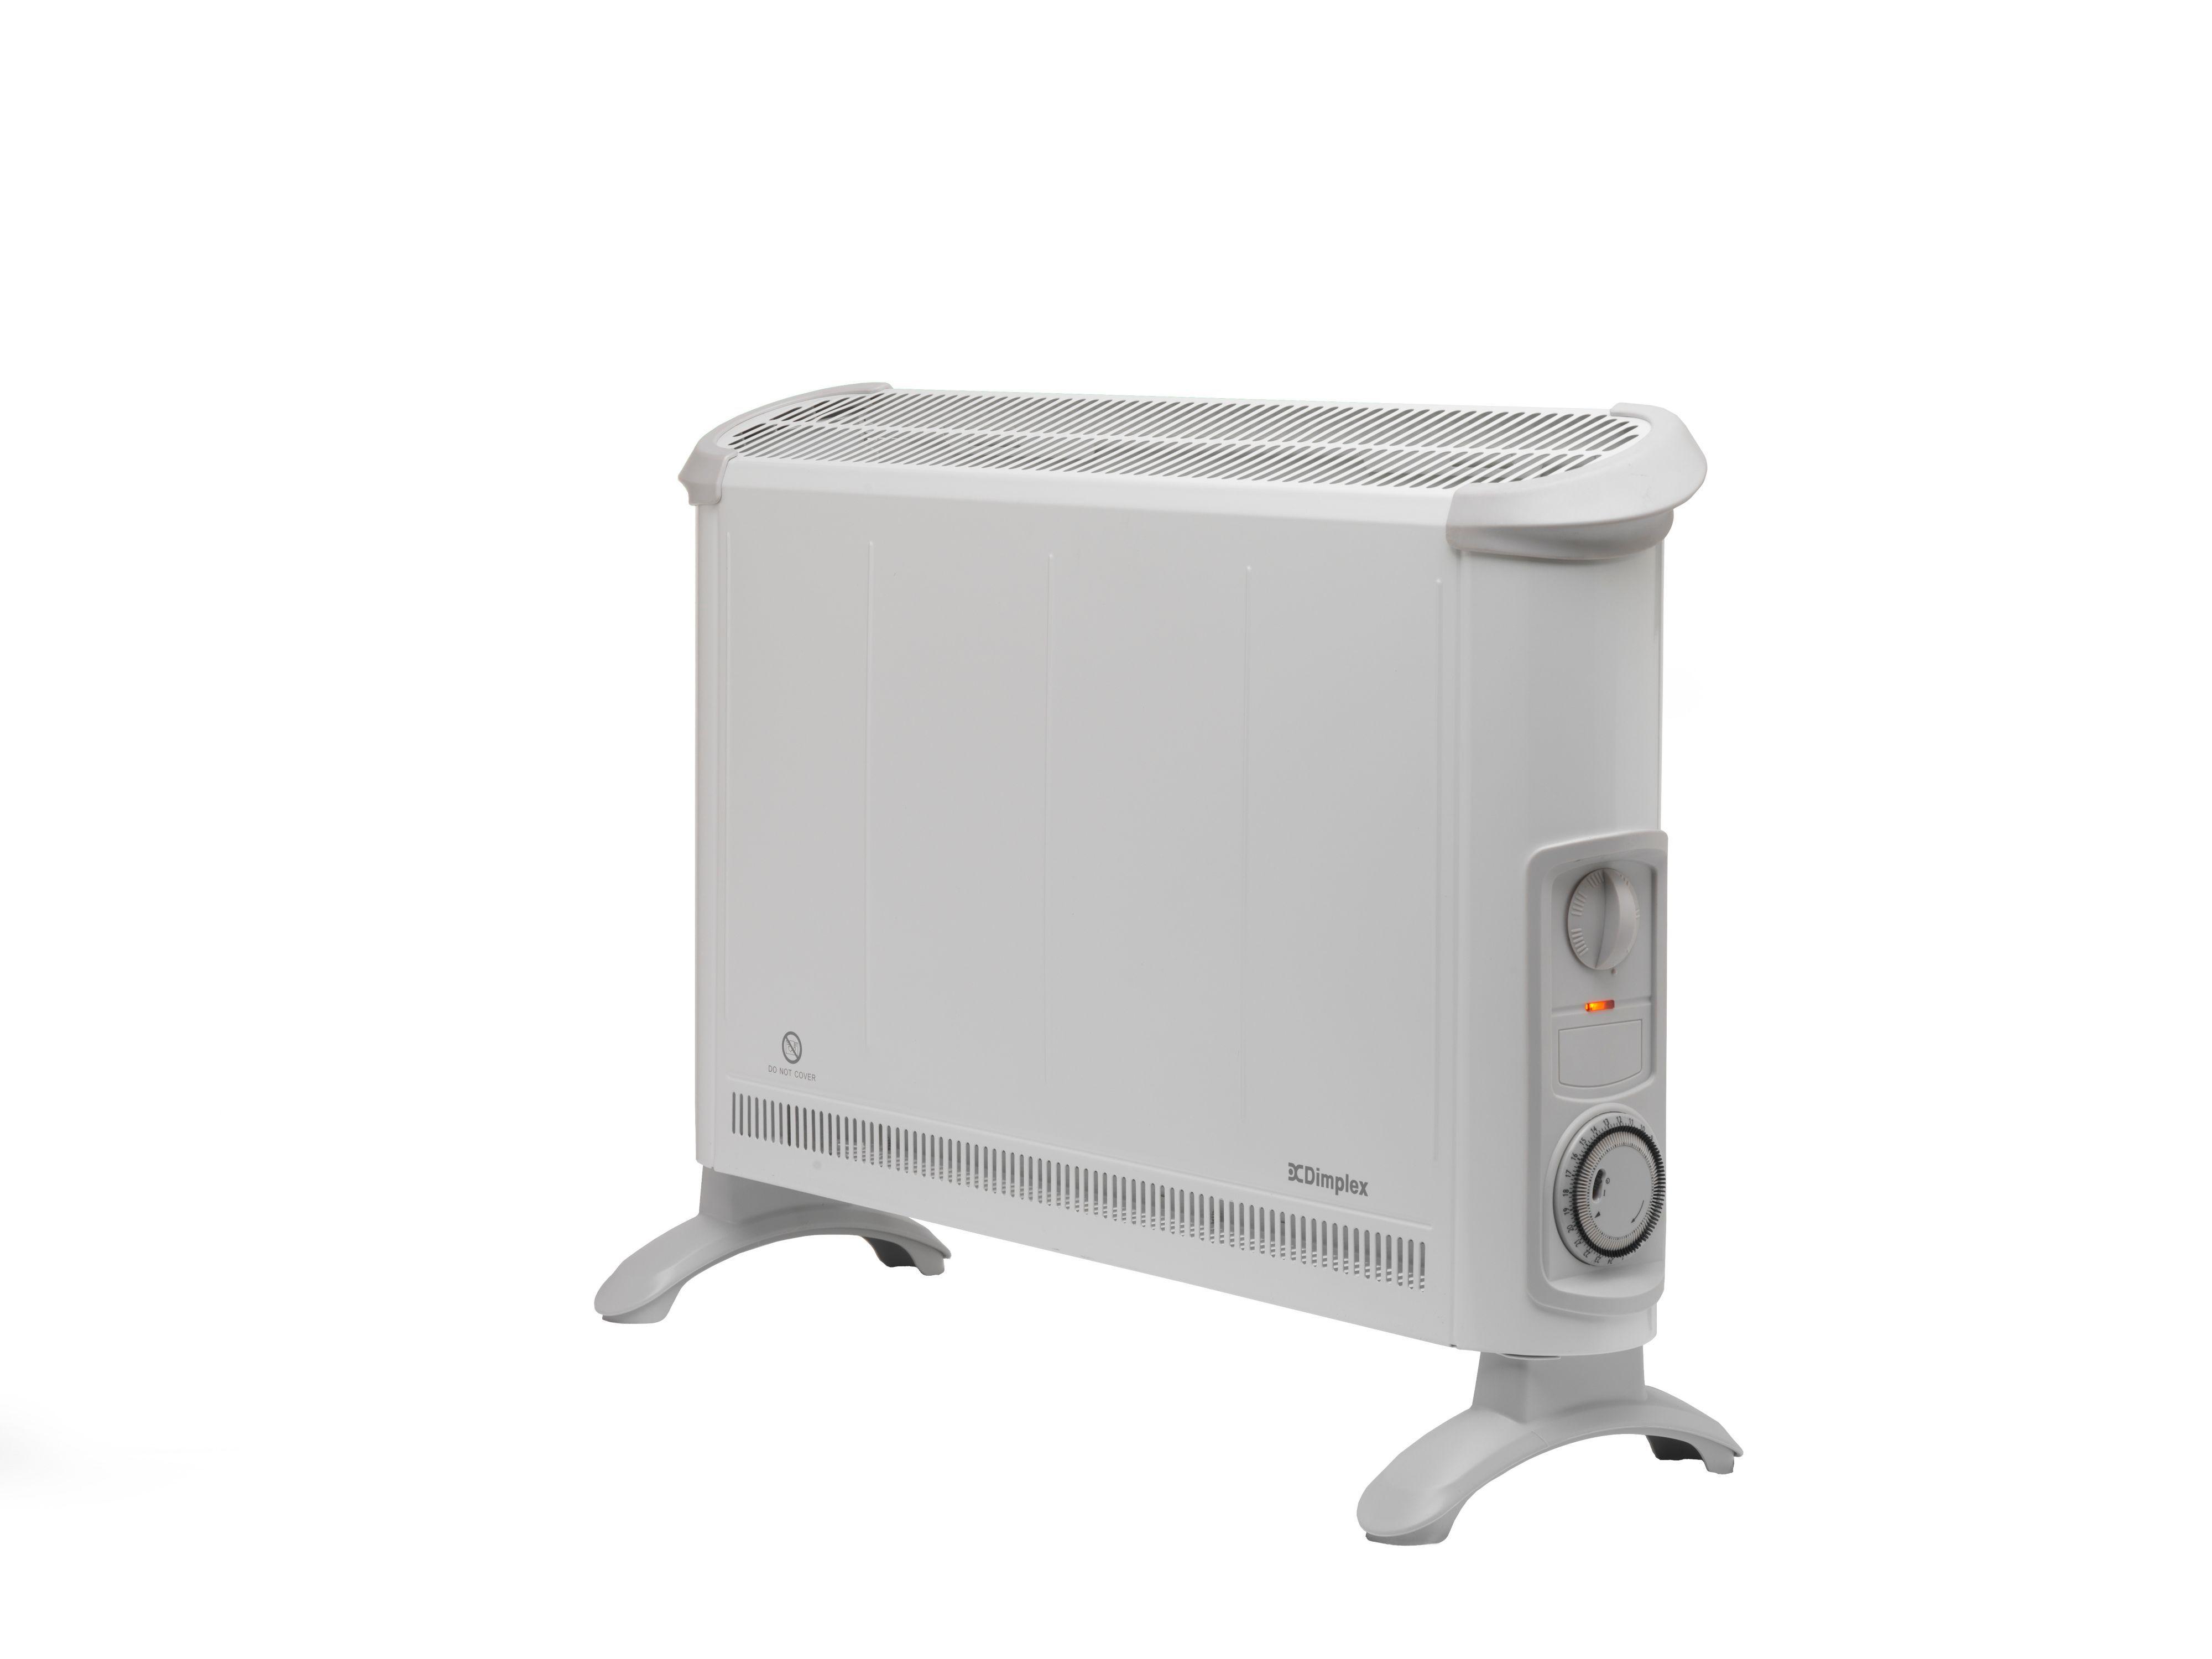 handy as tv bathtub com on space watts portable ip walmart heater seen